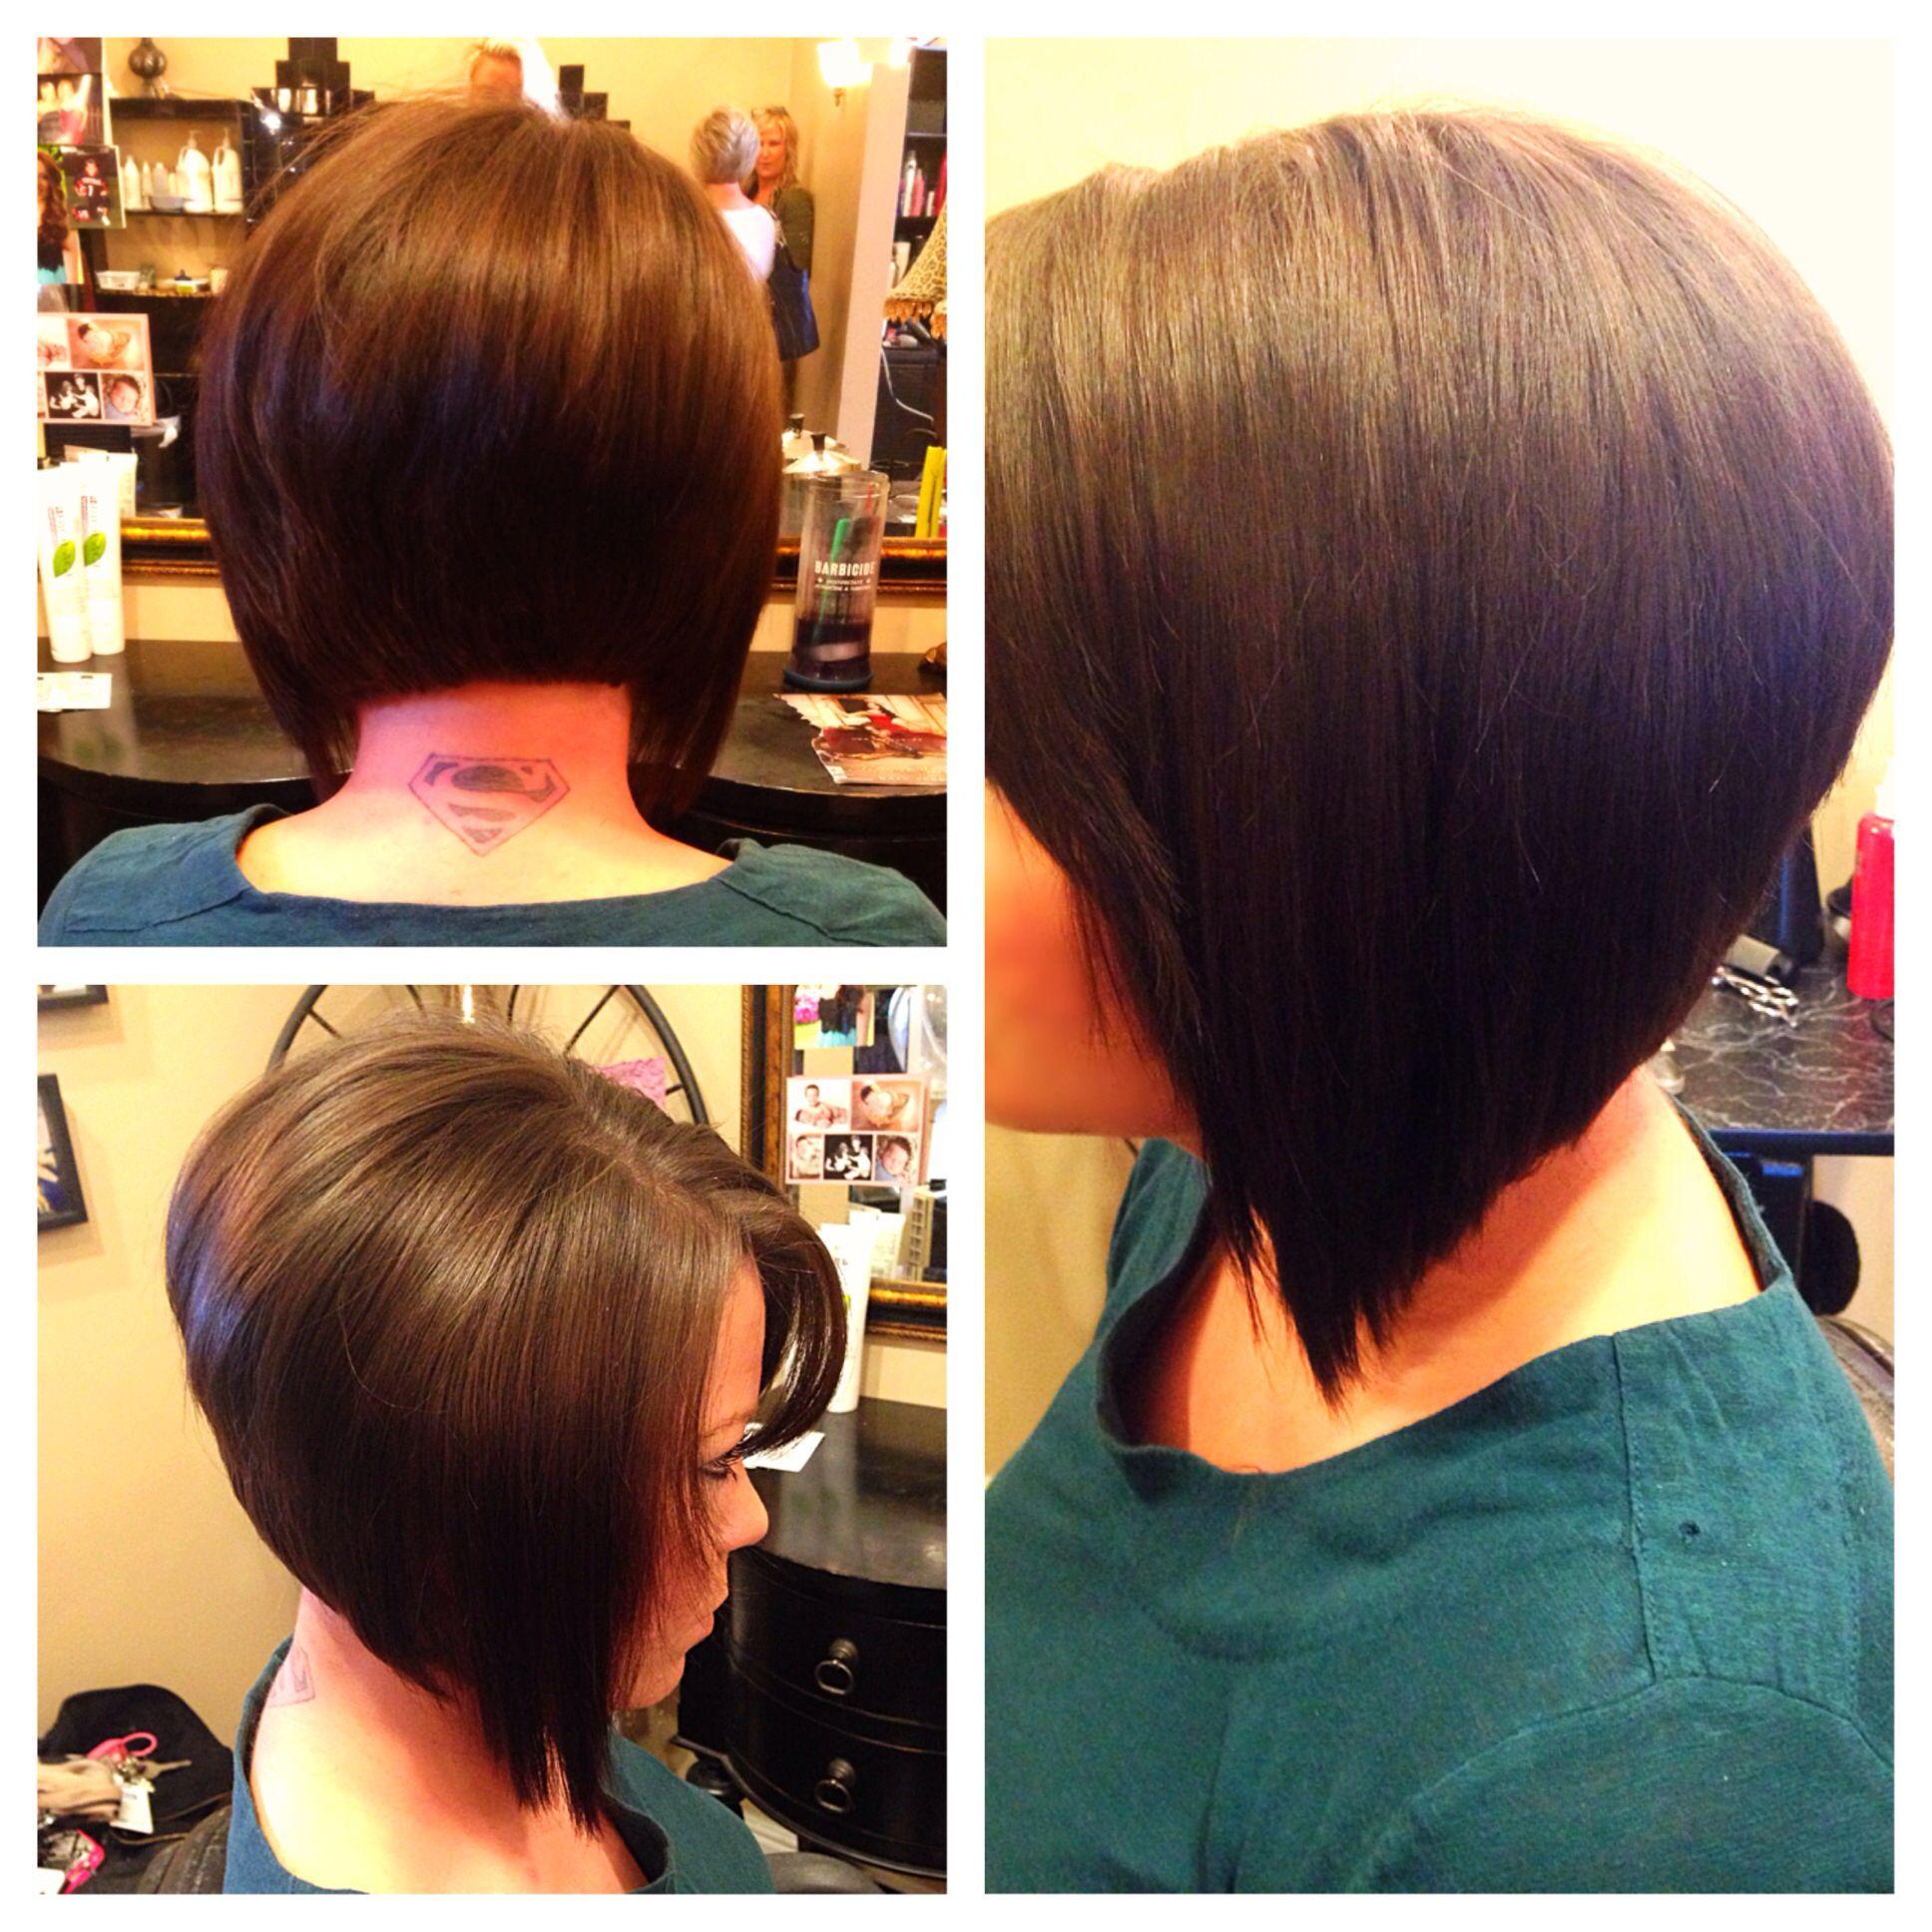 Short stacked layered bob inverted hair style haircut ...